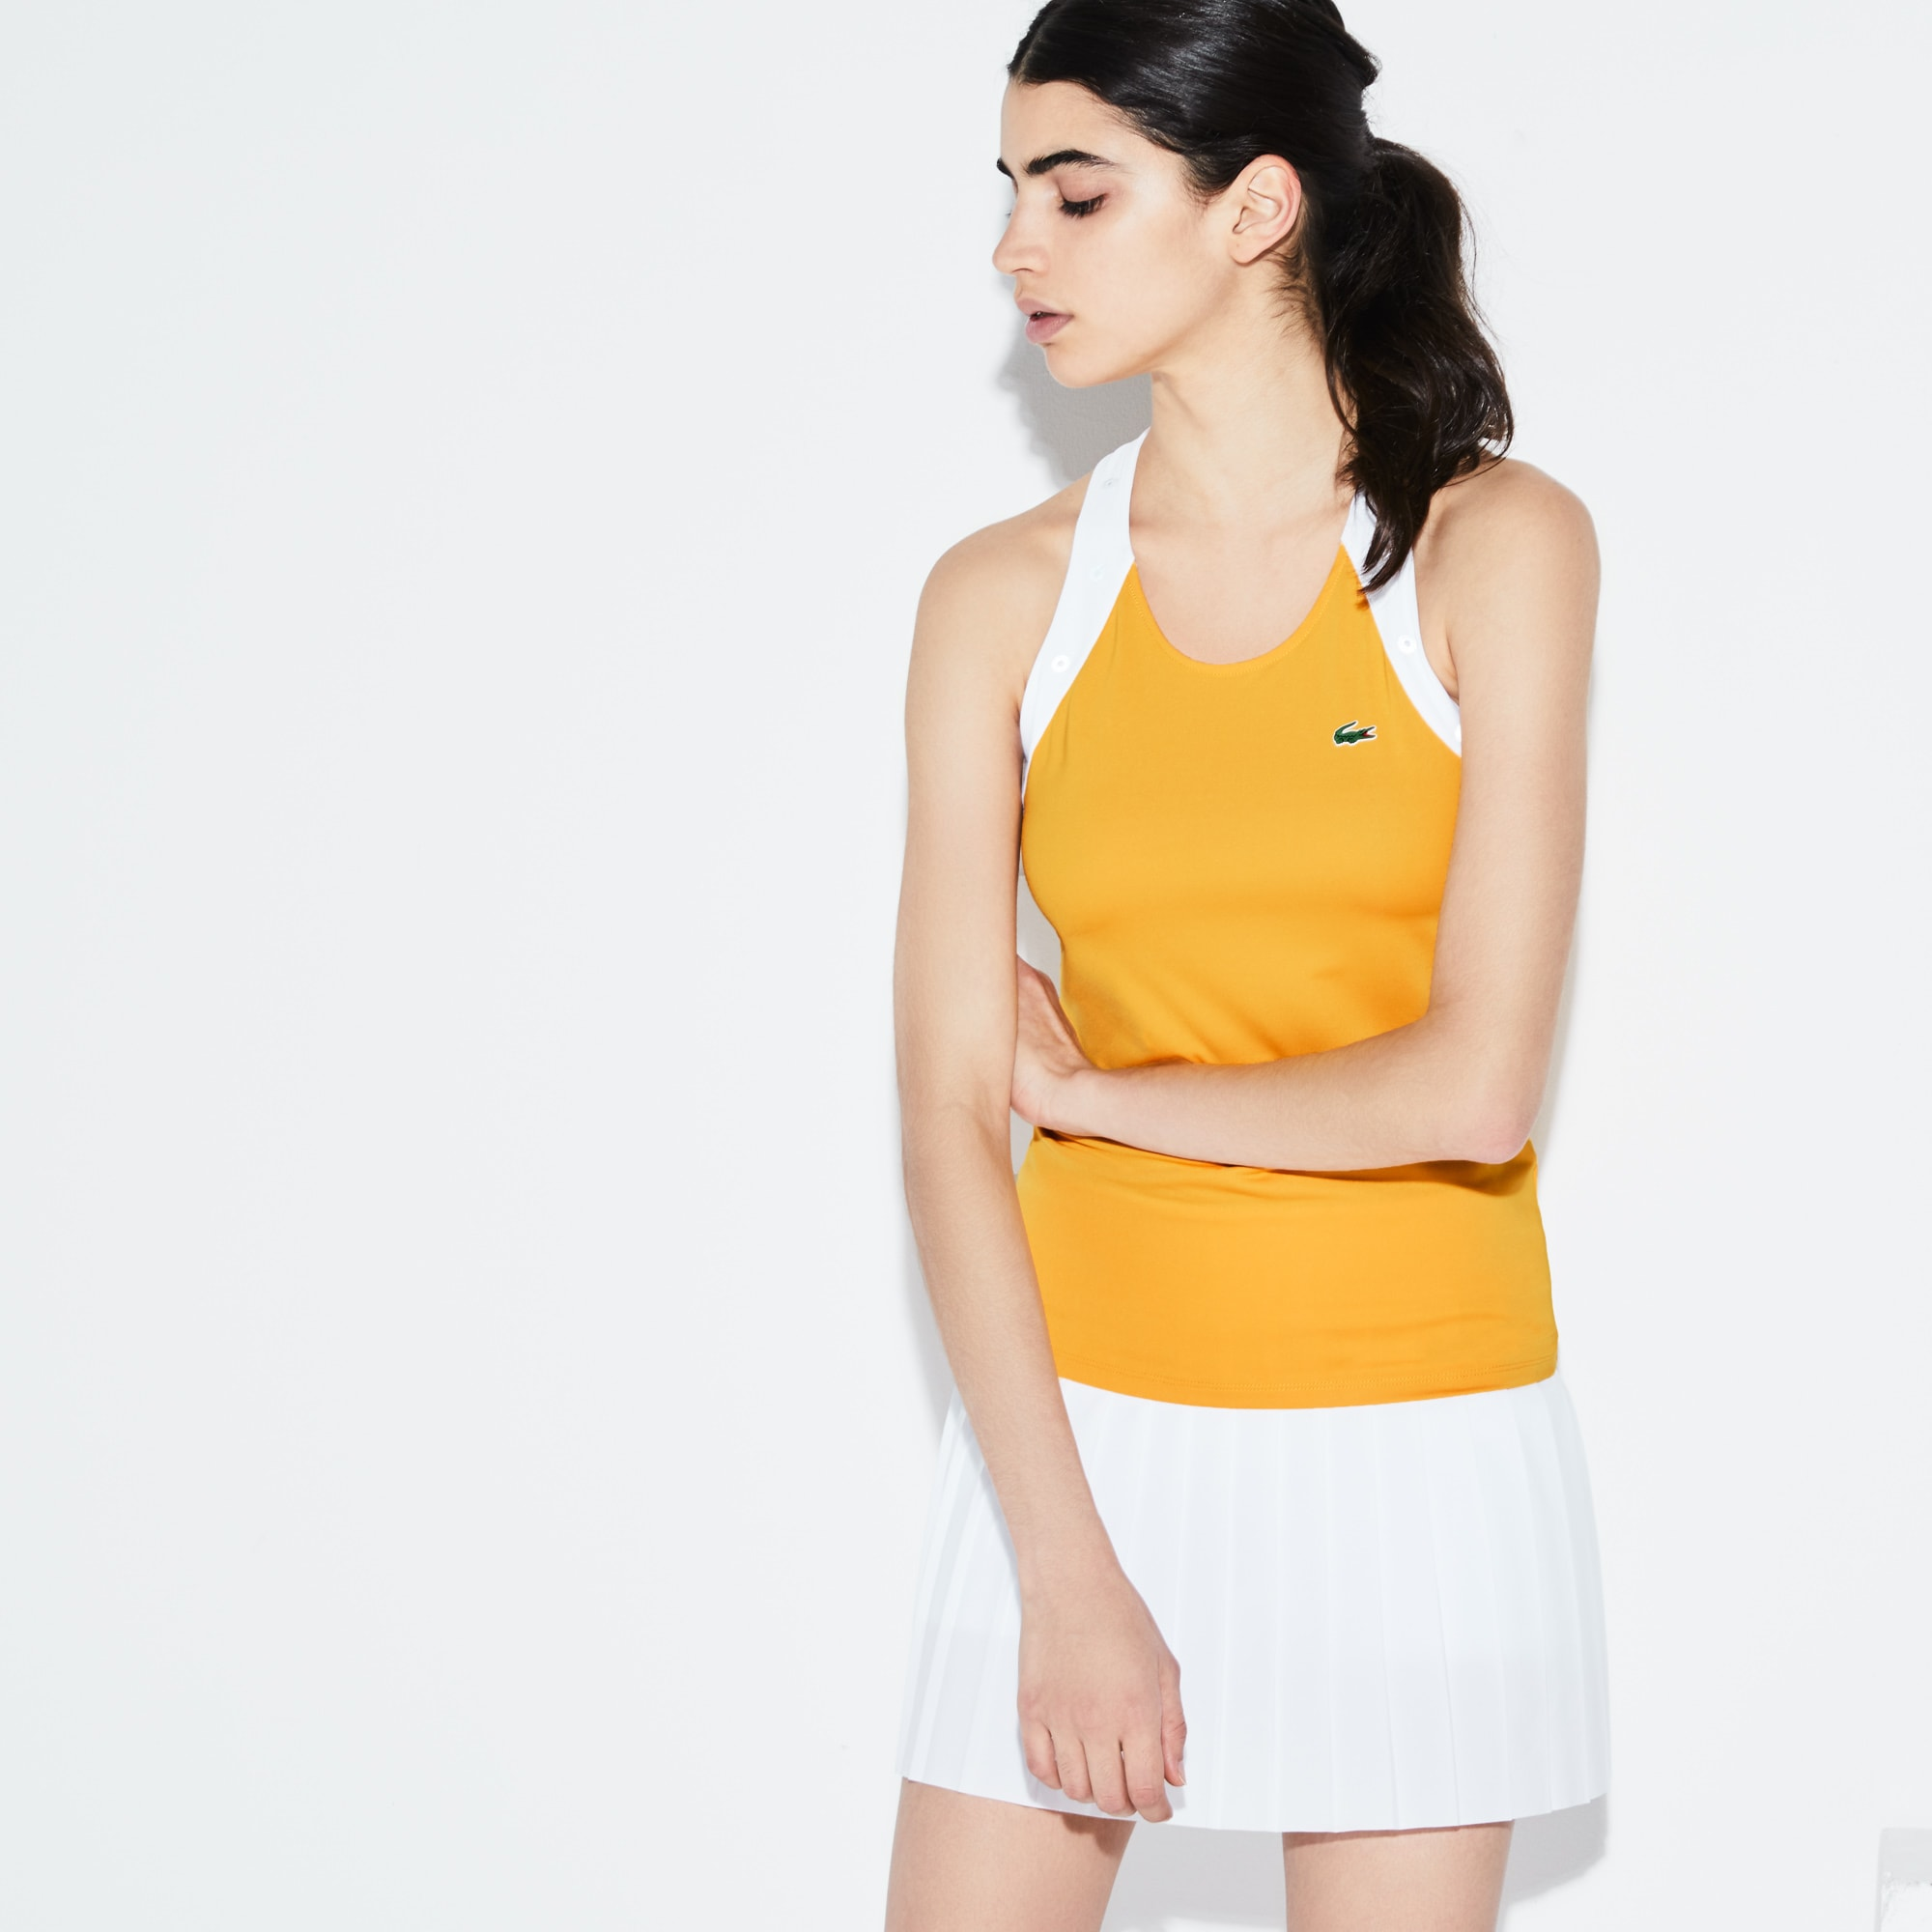 Top com decote nadador nas costas Tennis Lacoste SPORT em jersey técnico bicolor